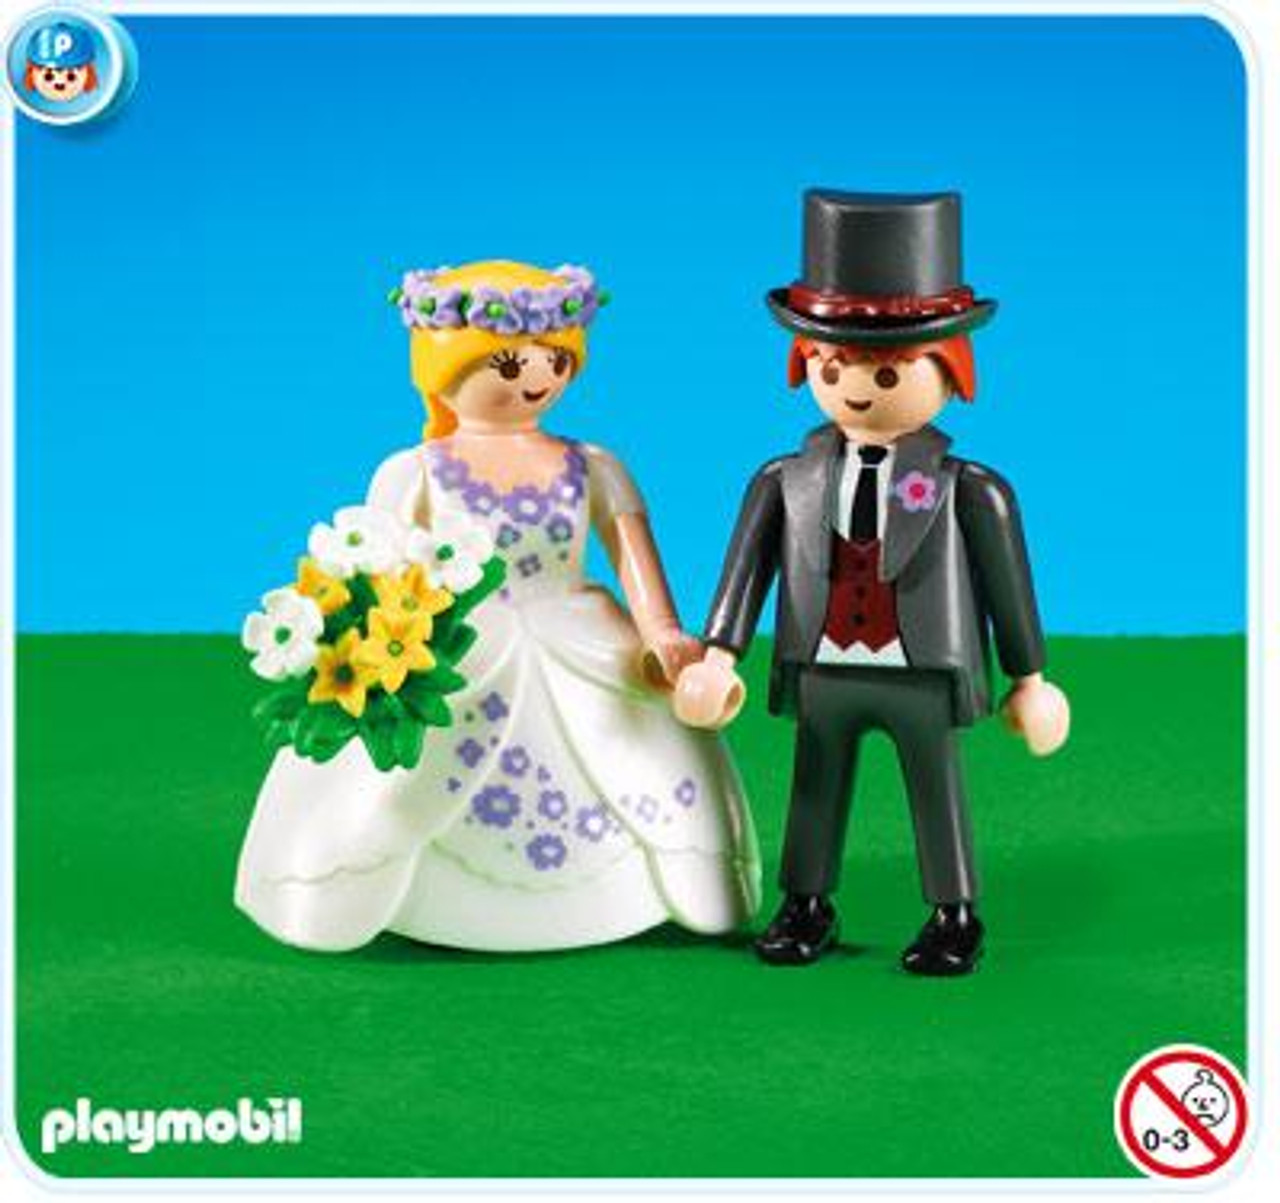 Playmobil Figures Bride & Groom Set #7497